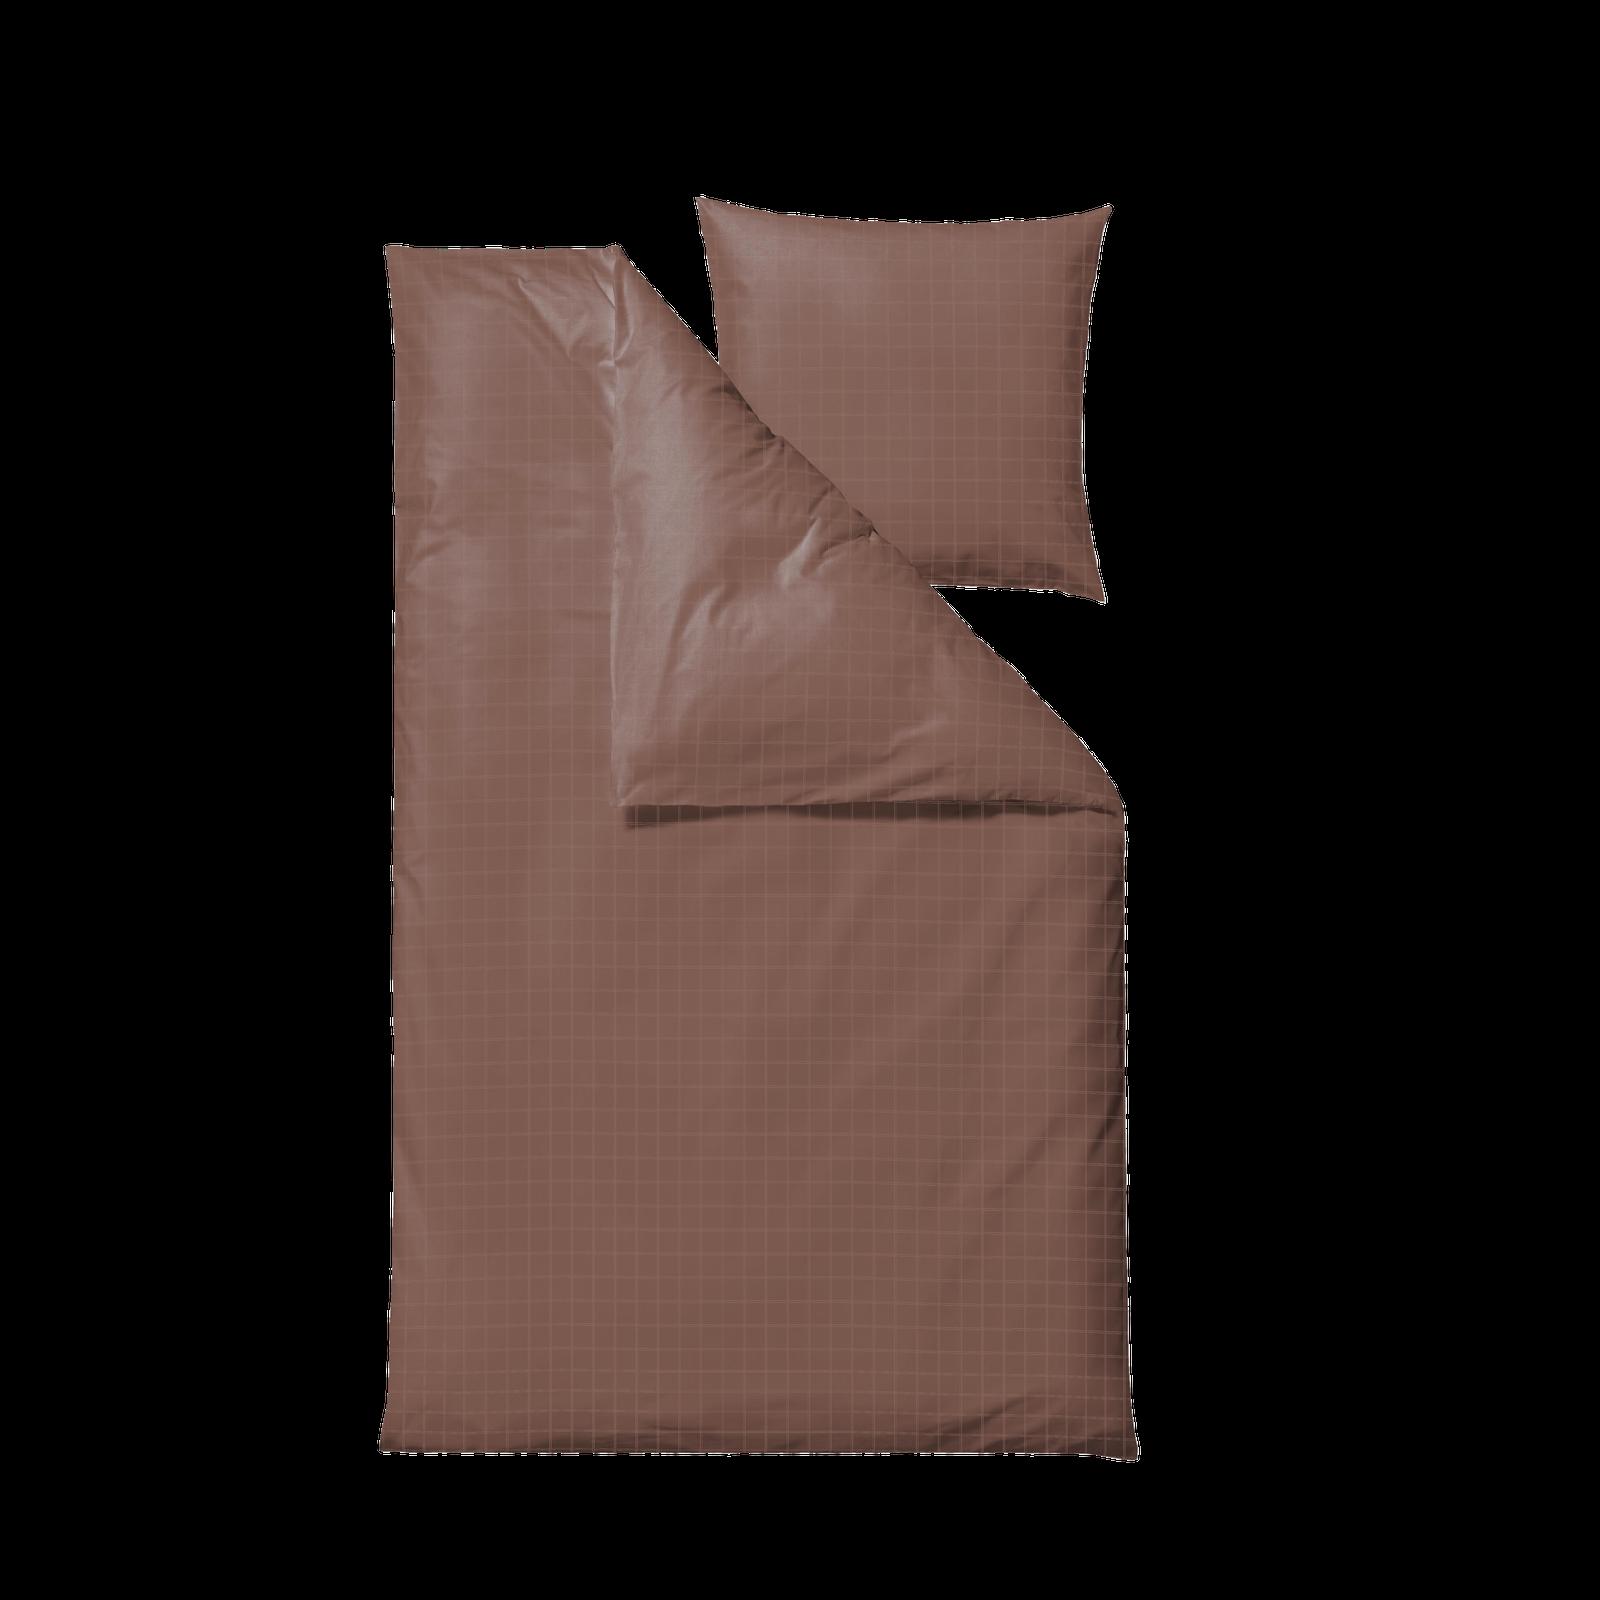 Södahl - Clear Bedding Sets 140 x 200 cm - Rosewood (12035)